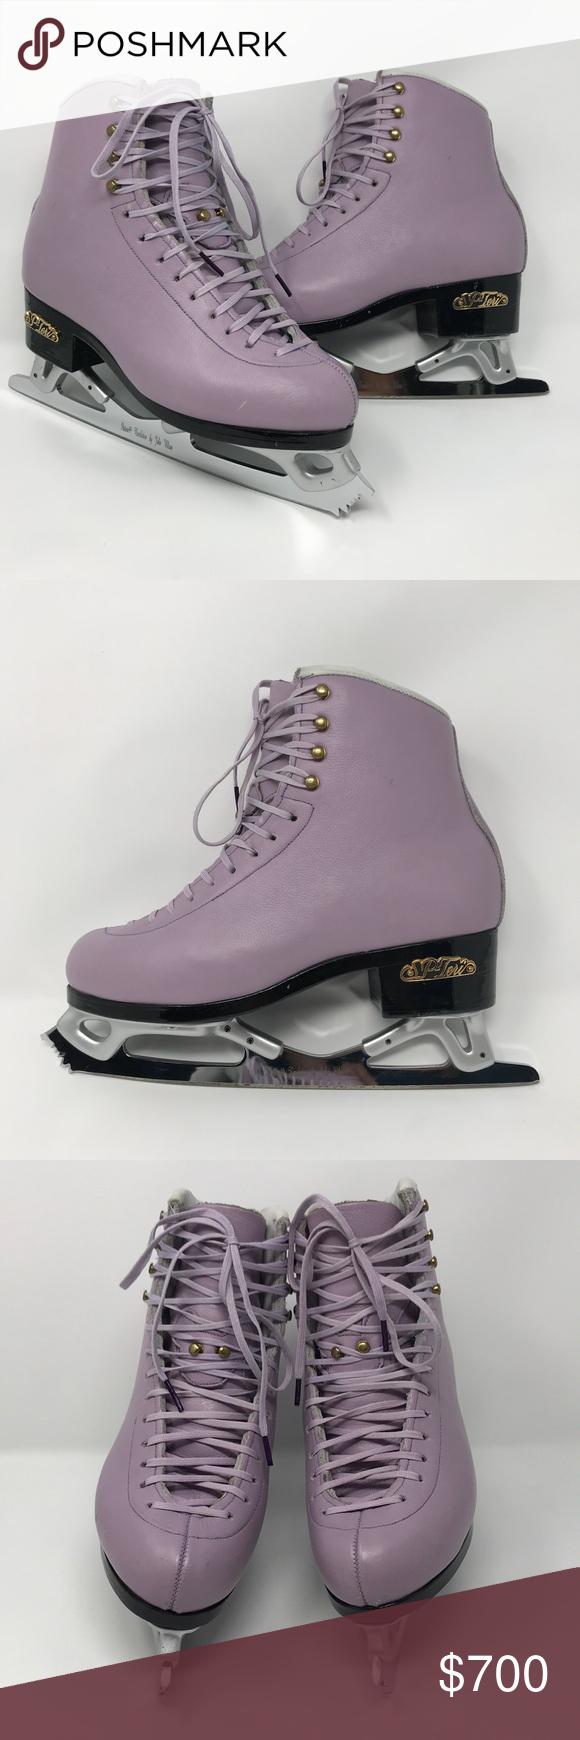 Custom Purple Spteri Ice Figure Skates Lavender Ice Skates Size 6 Wide Black Lacquer Sole With Pattern 99 Revolution John Wilson B Figure Skating Purple Boots